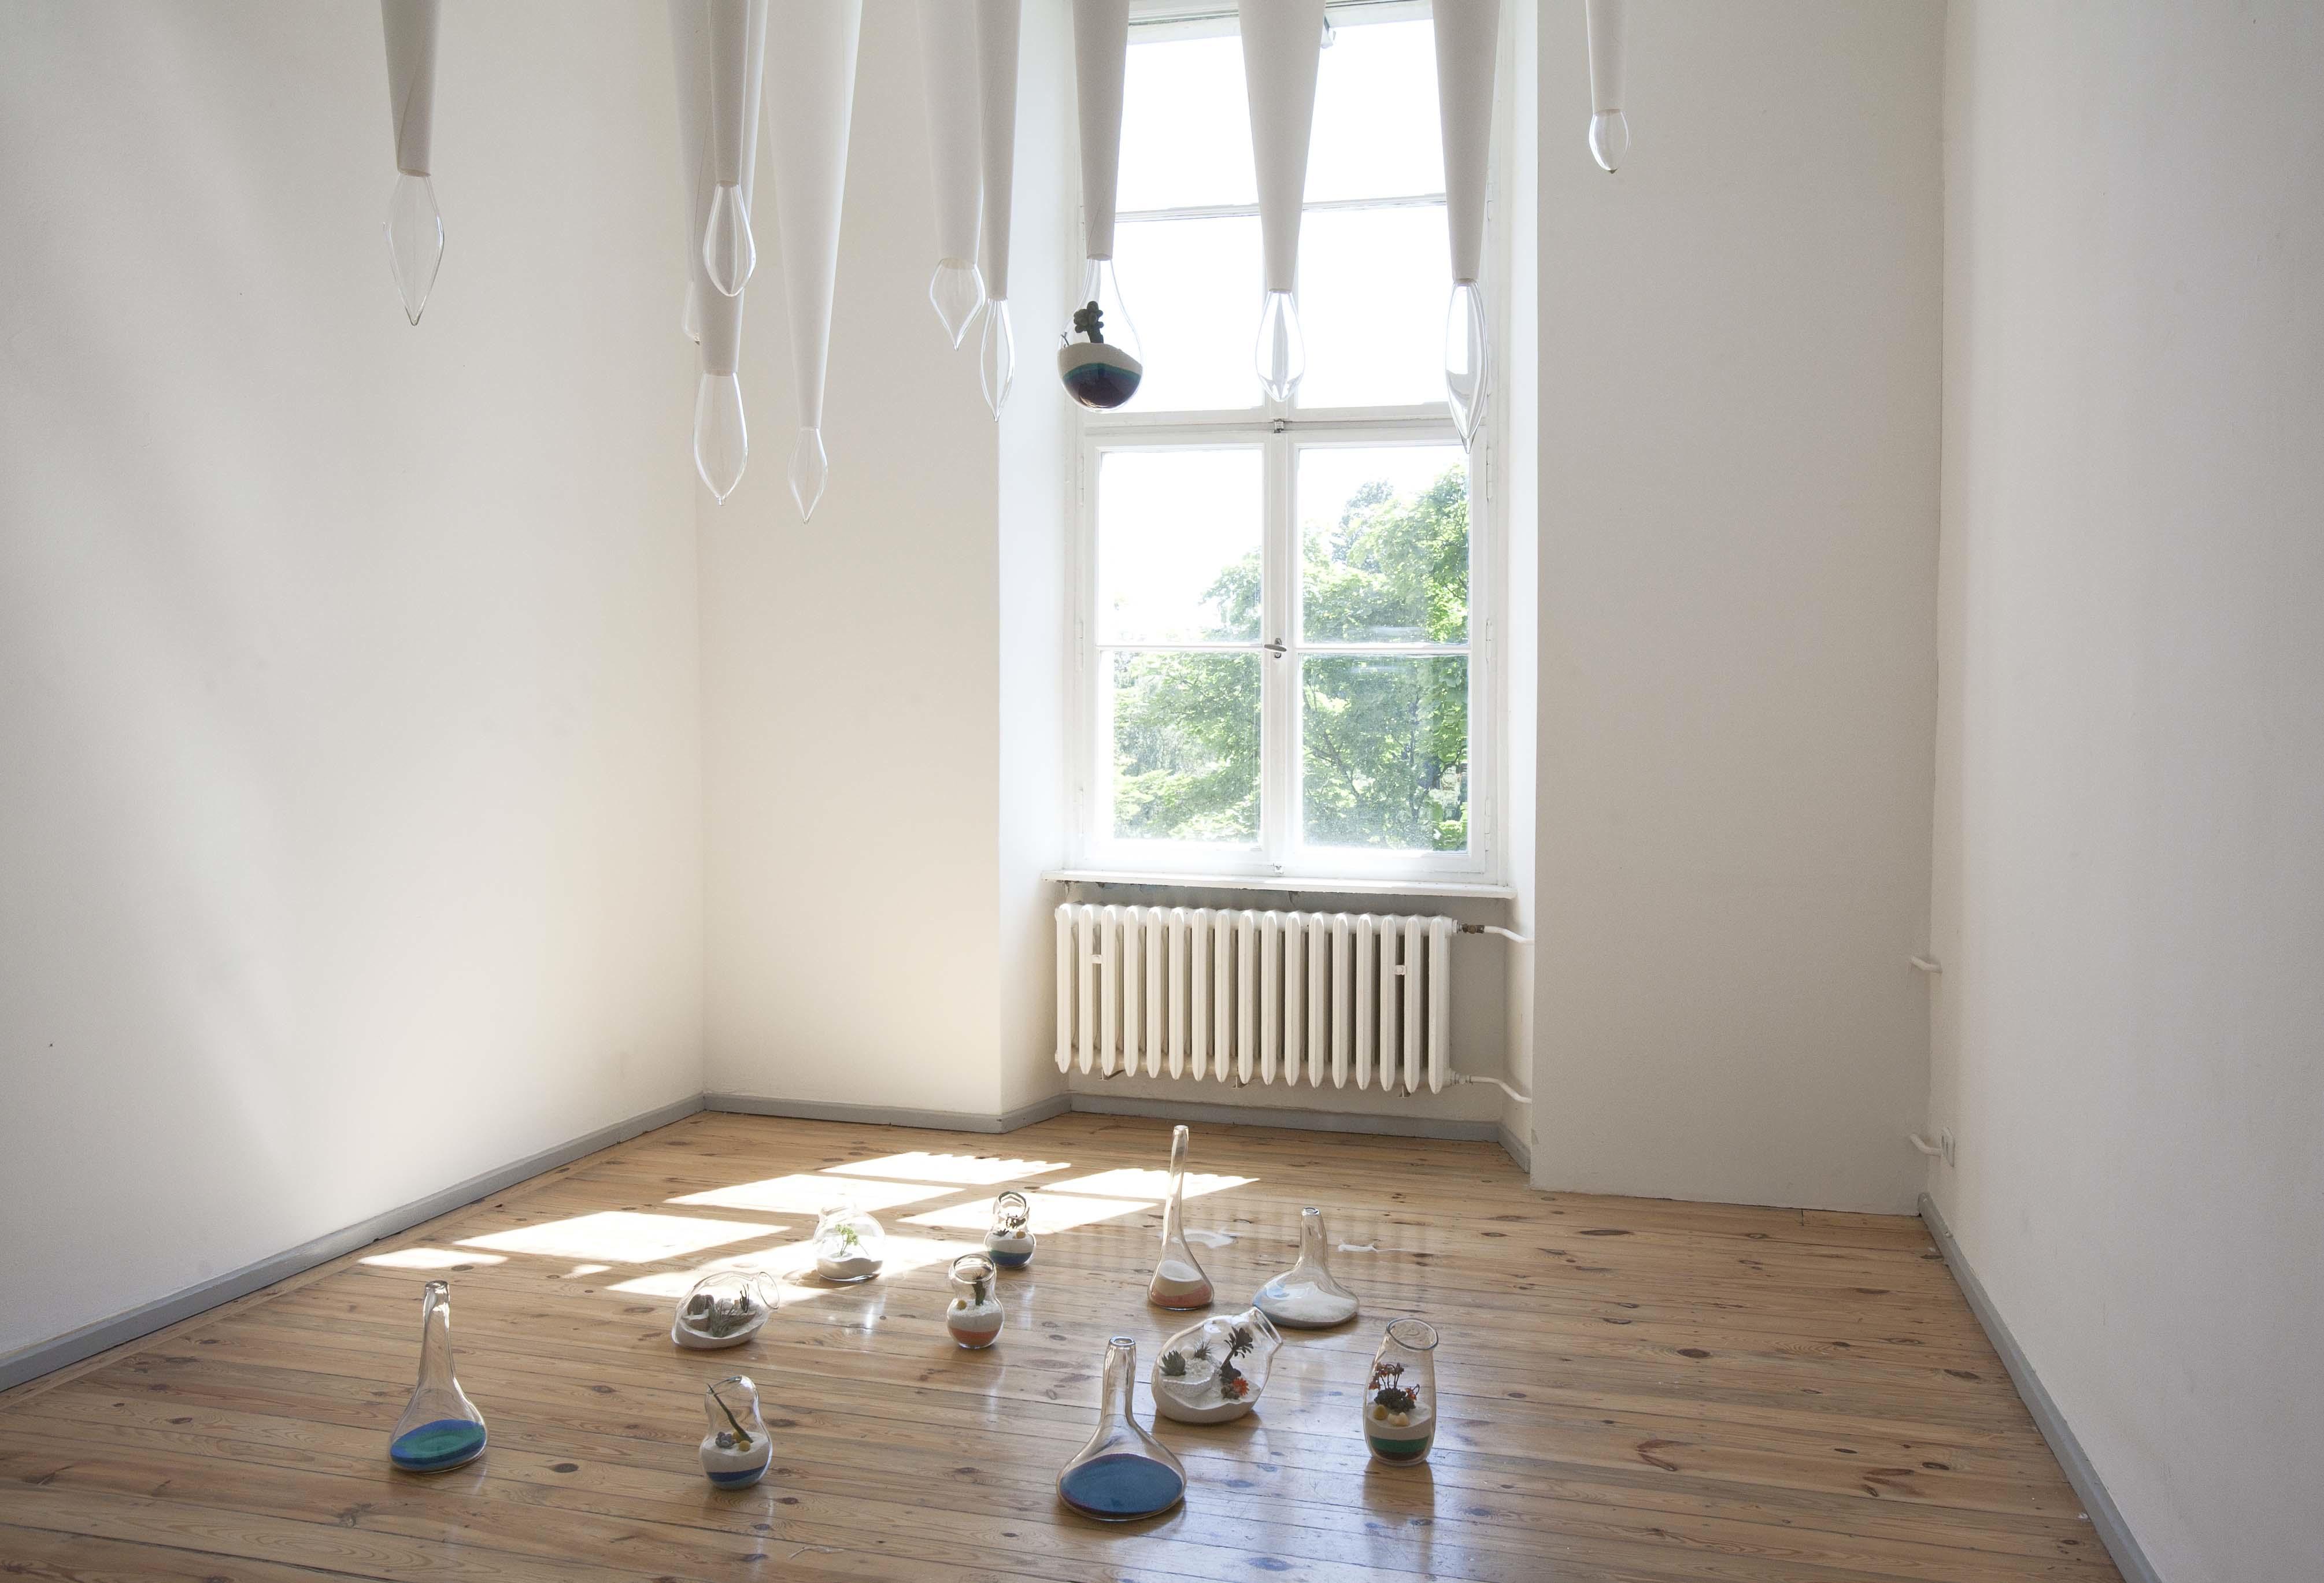 Fabrik installation by Lauren Coleman